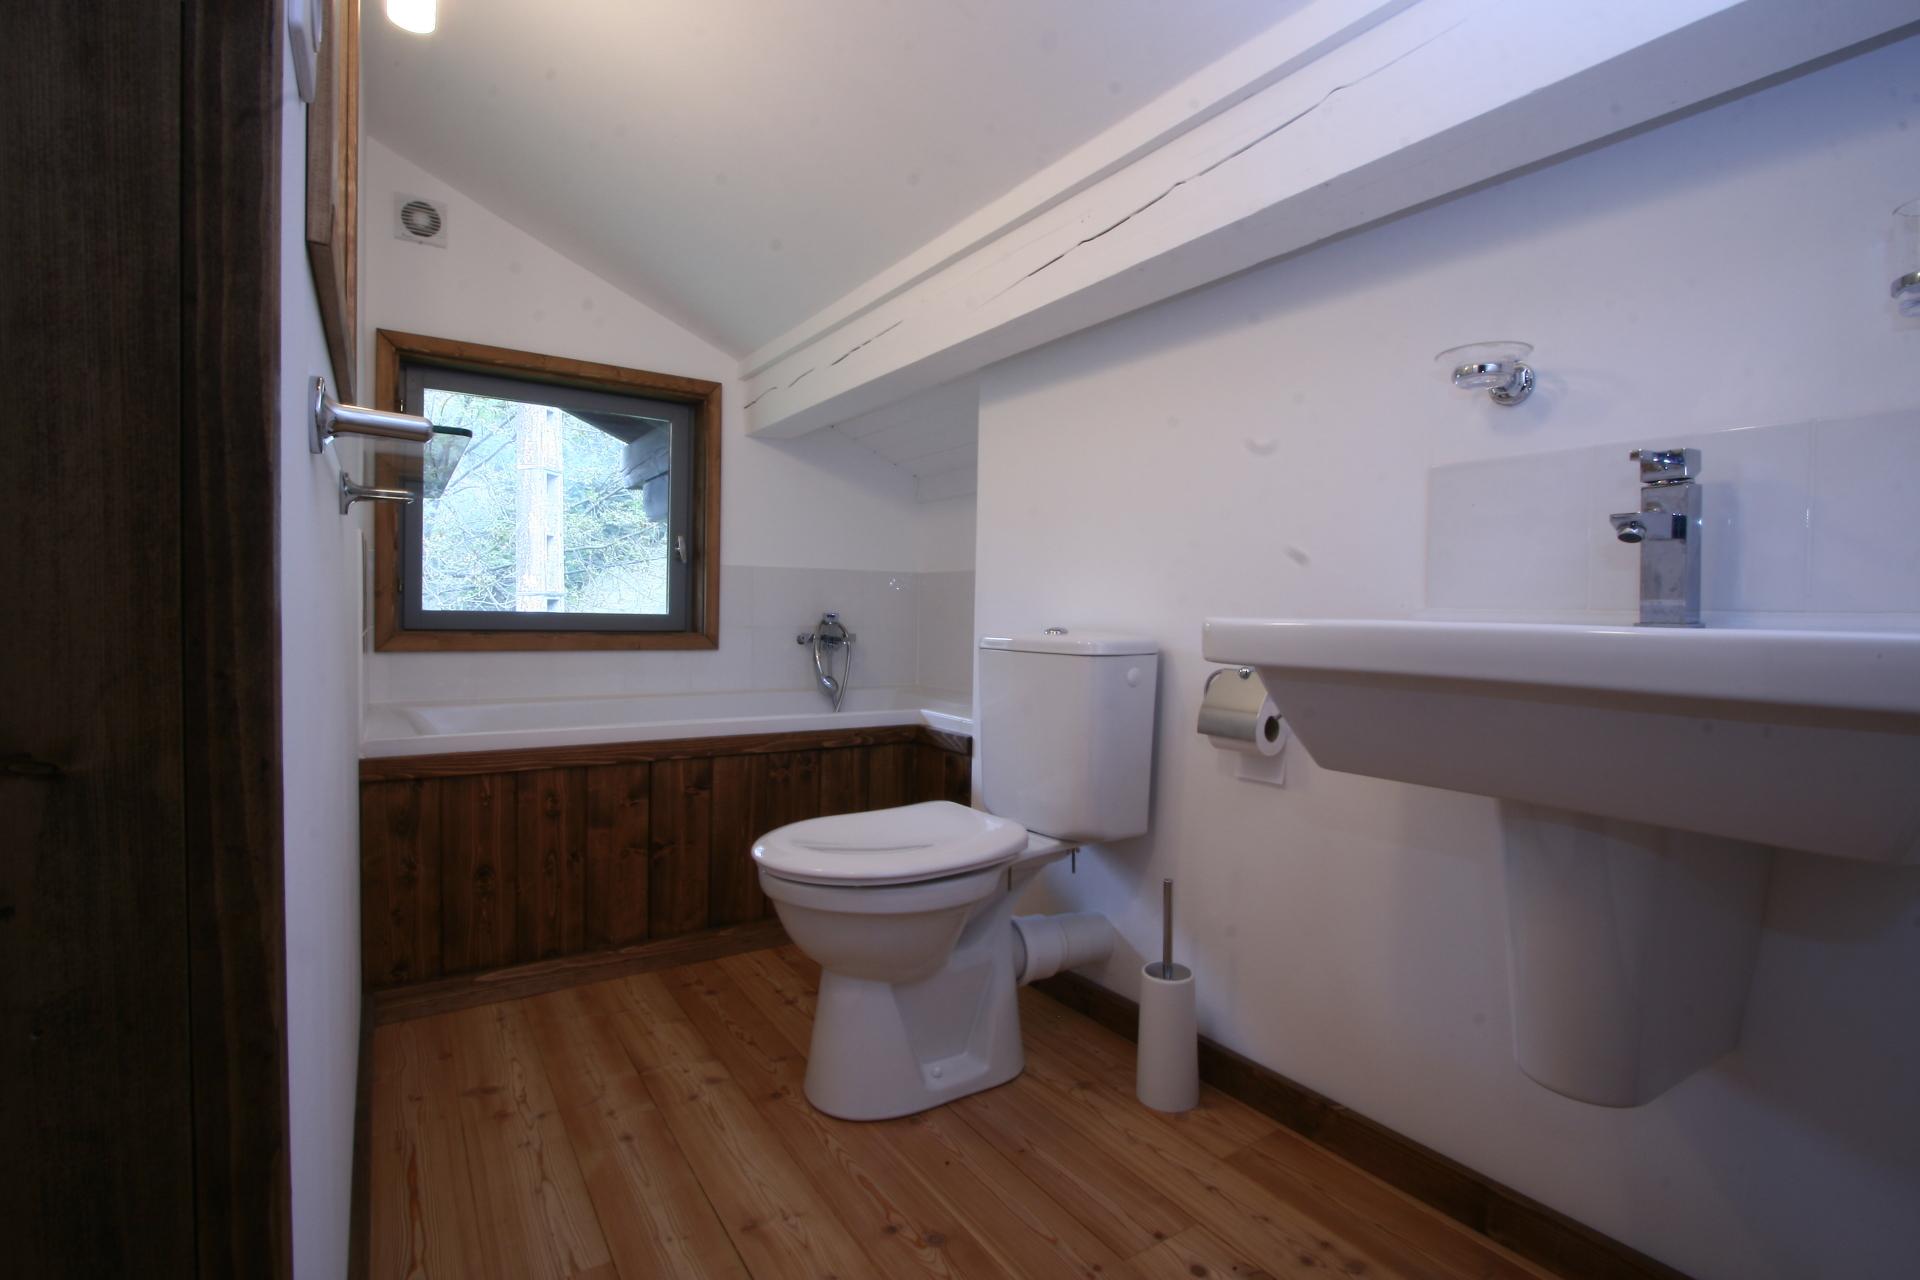 Chalet bathroom | Renovation Solutions